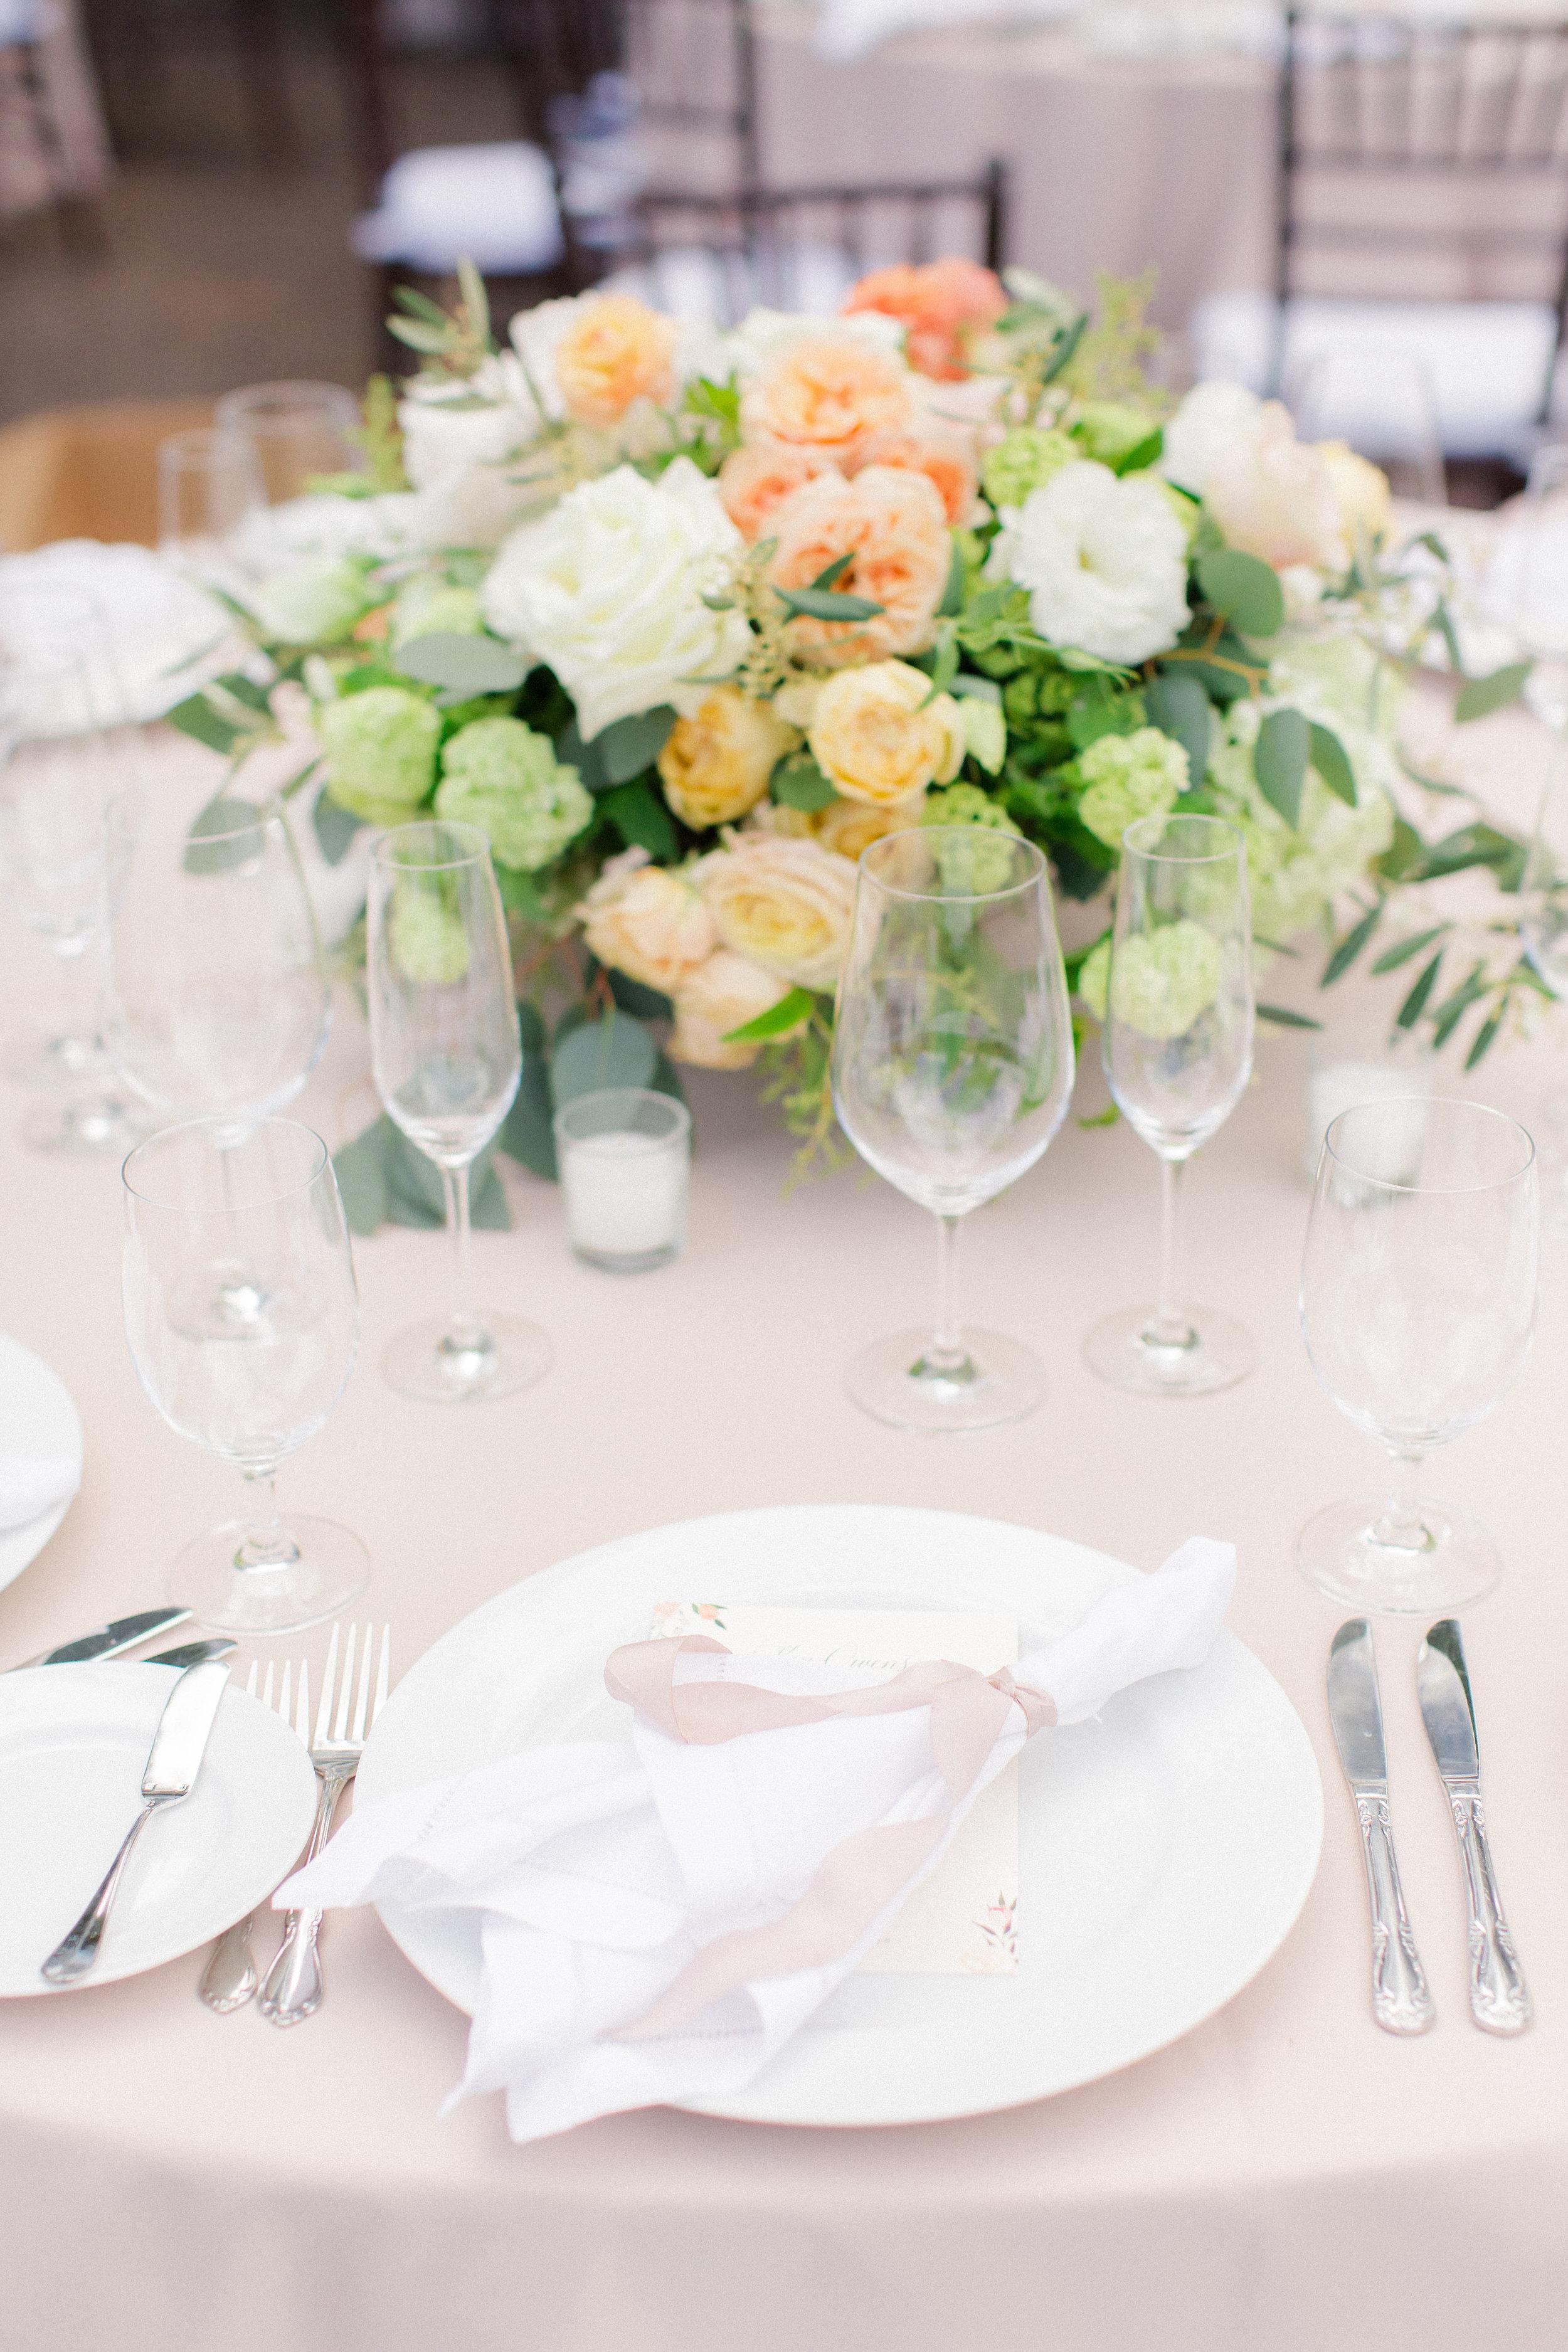 california-wedding-day-lrelyea-events-lori-paladino-photography9.jpg